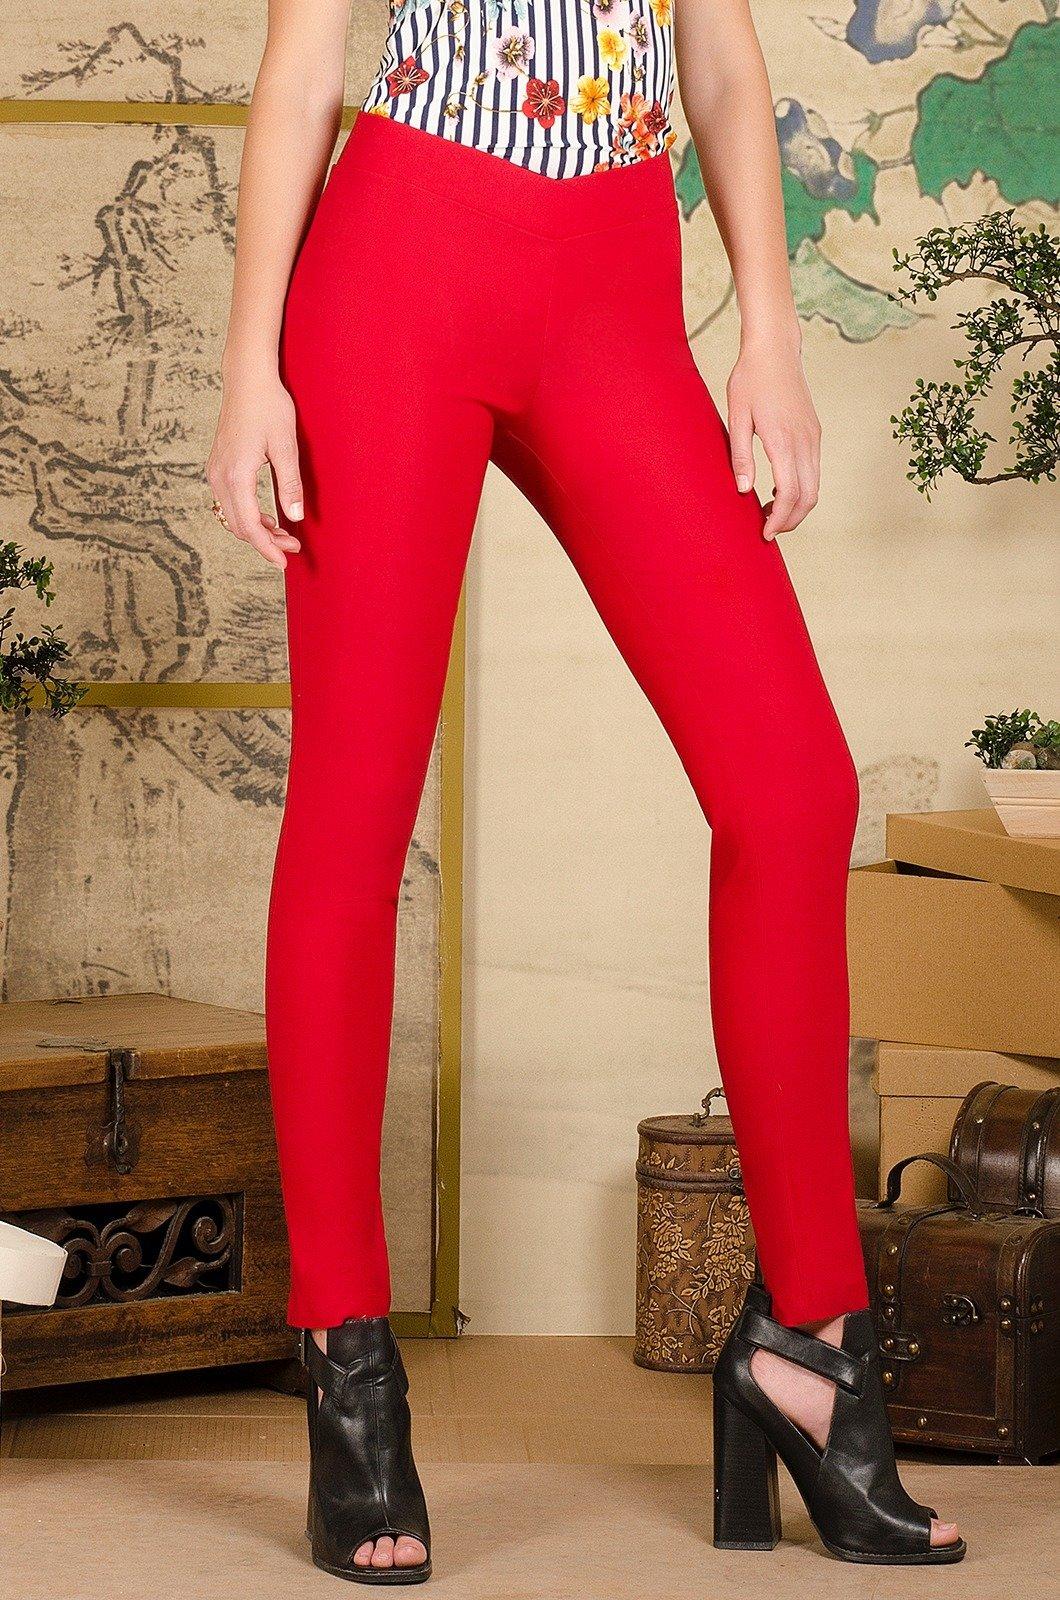 Legging rojo pretina cruzada - Chazari 1622